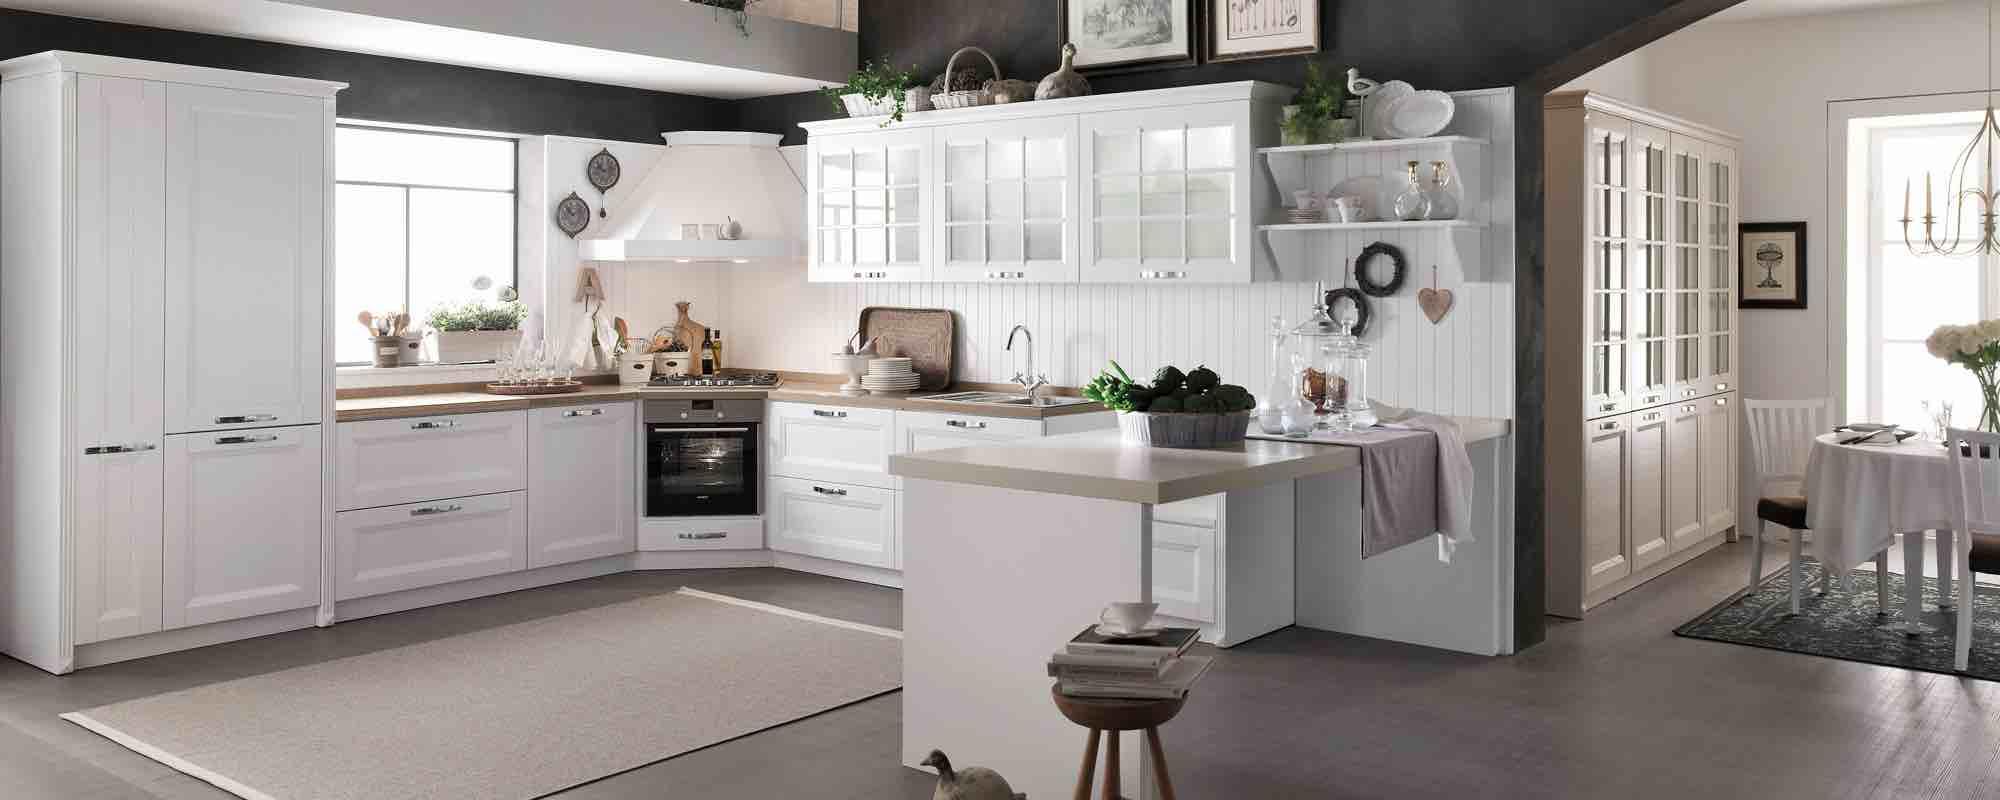 Cucine contemporanee vibo valentia scarcia arredamenti for Sedie contemporanee